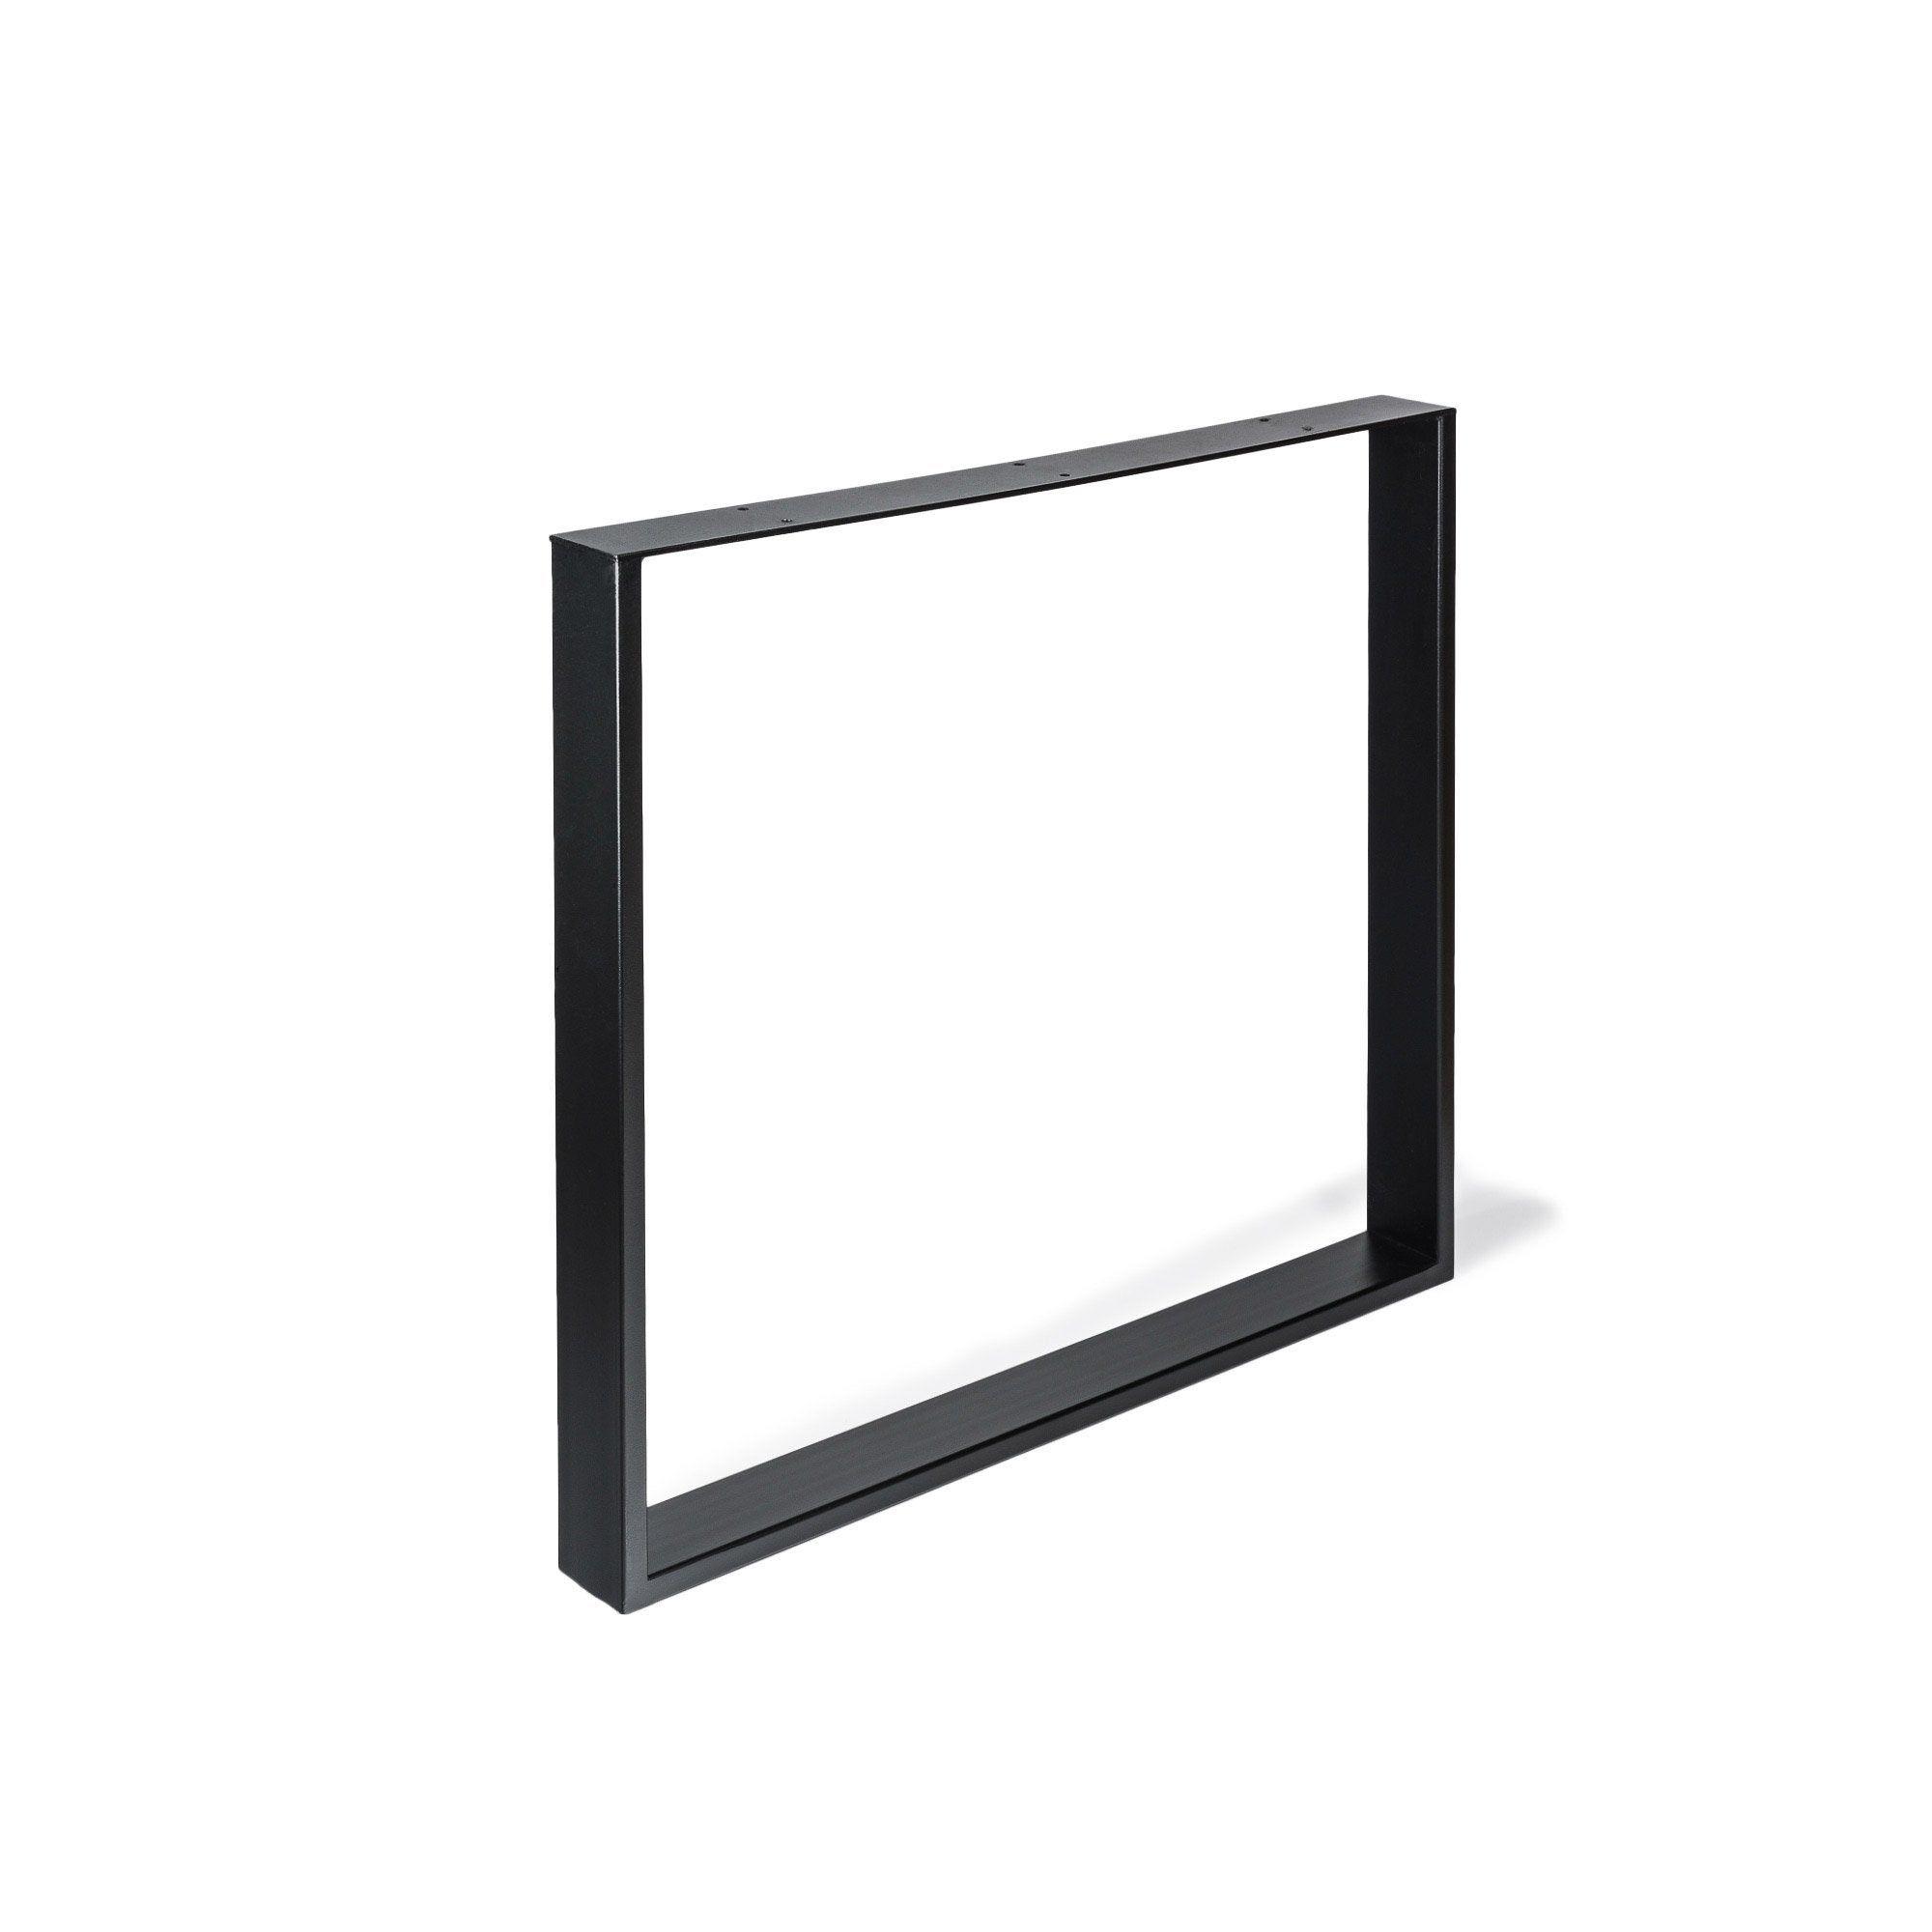 Pied Meuble Design Fixe Metal Brut Noir 71 Cm En 2020 Meuble Design Pied Meuble Et Brut